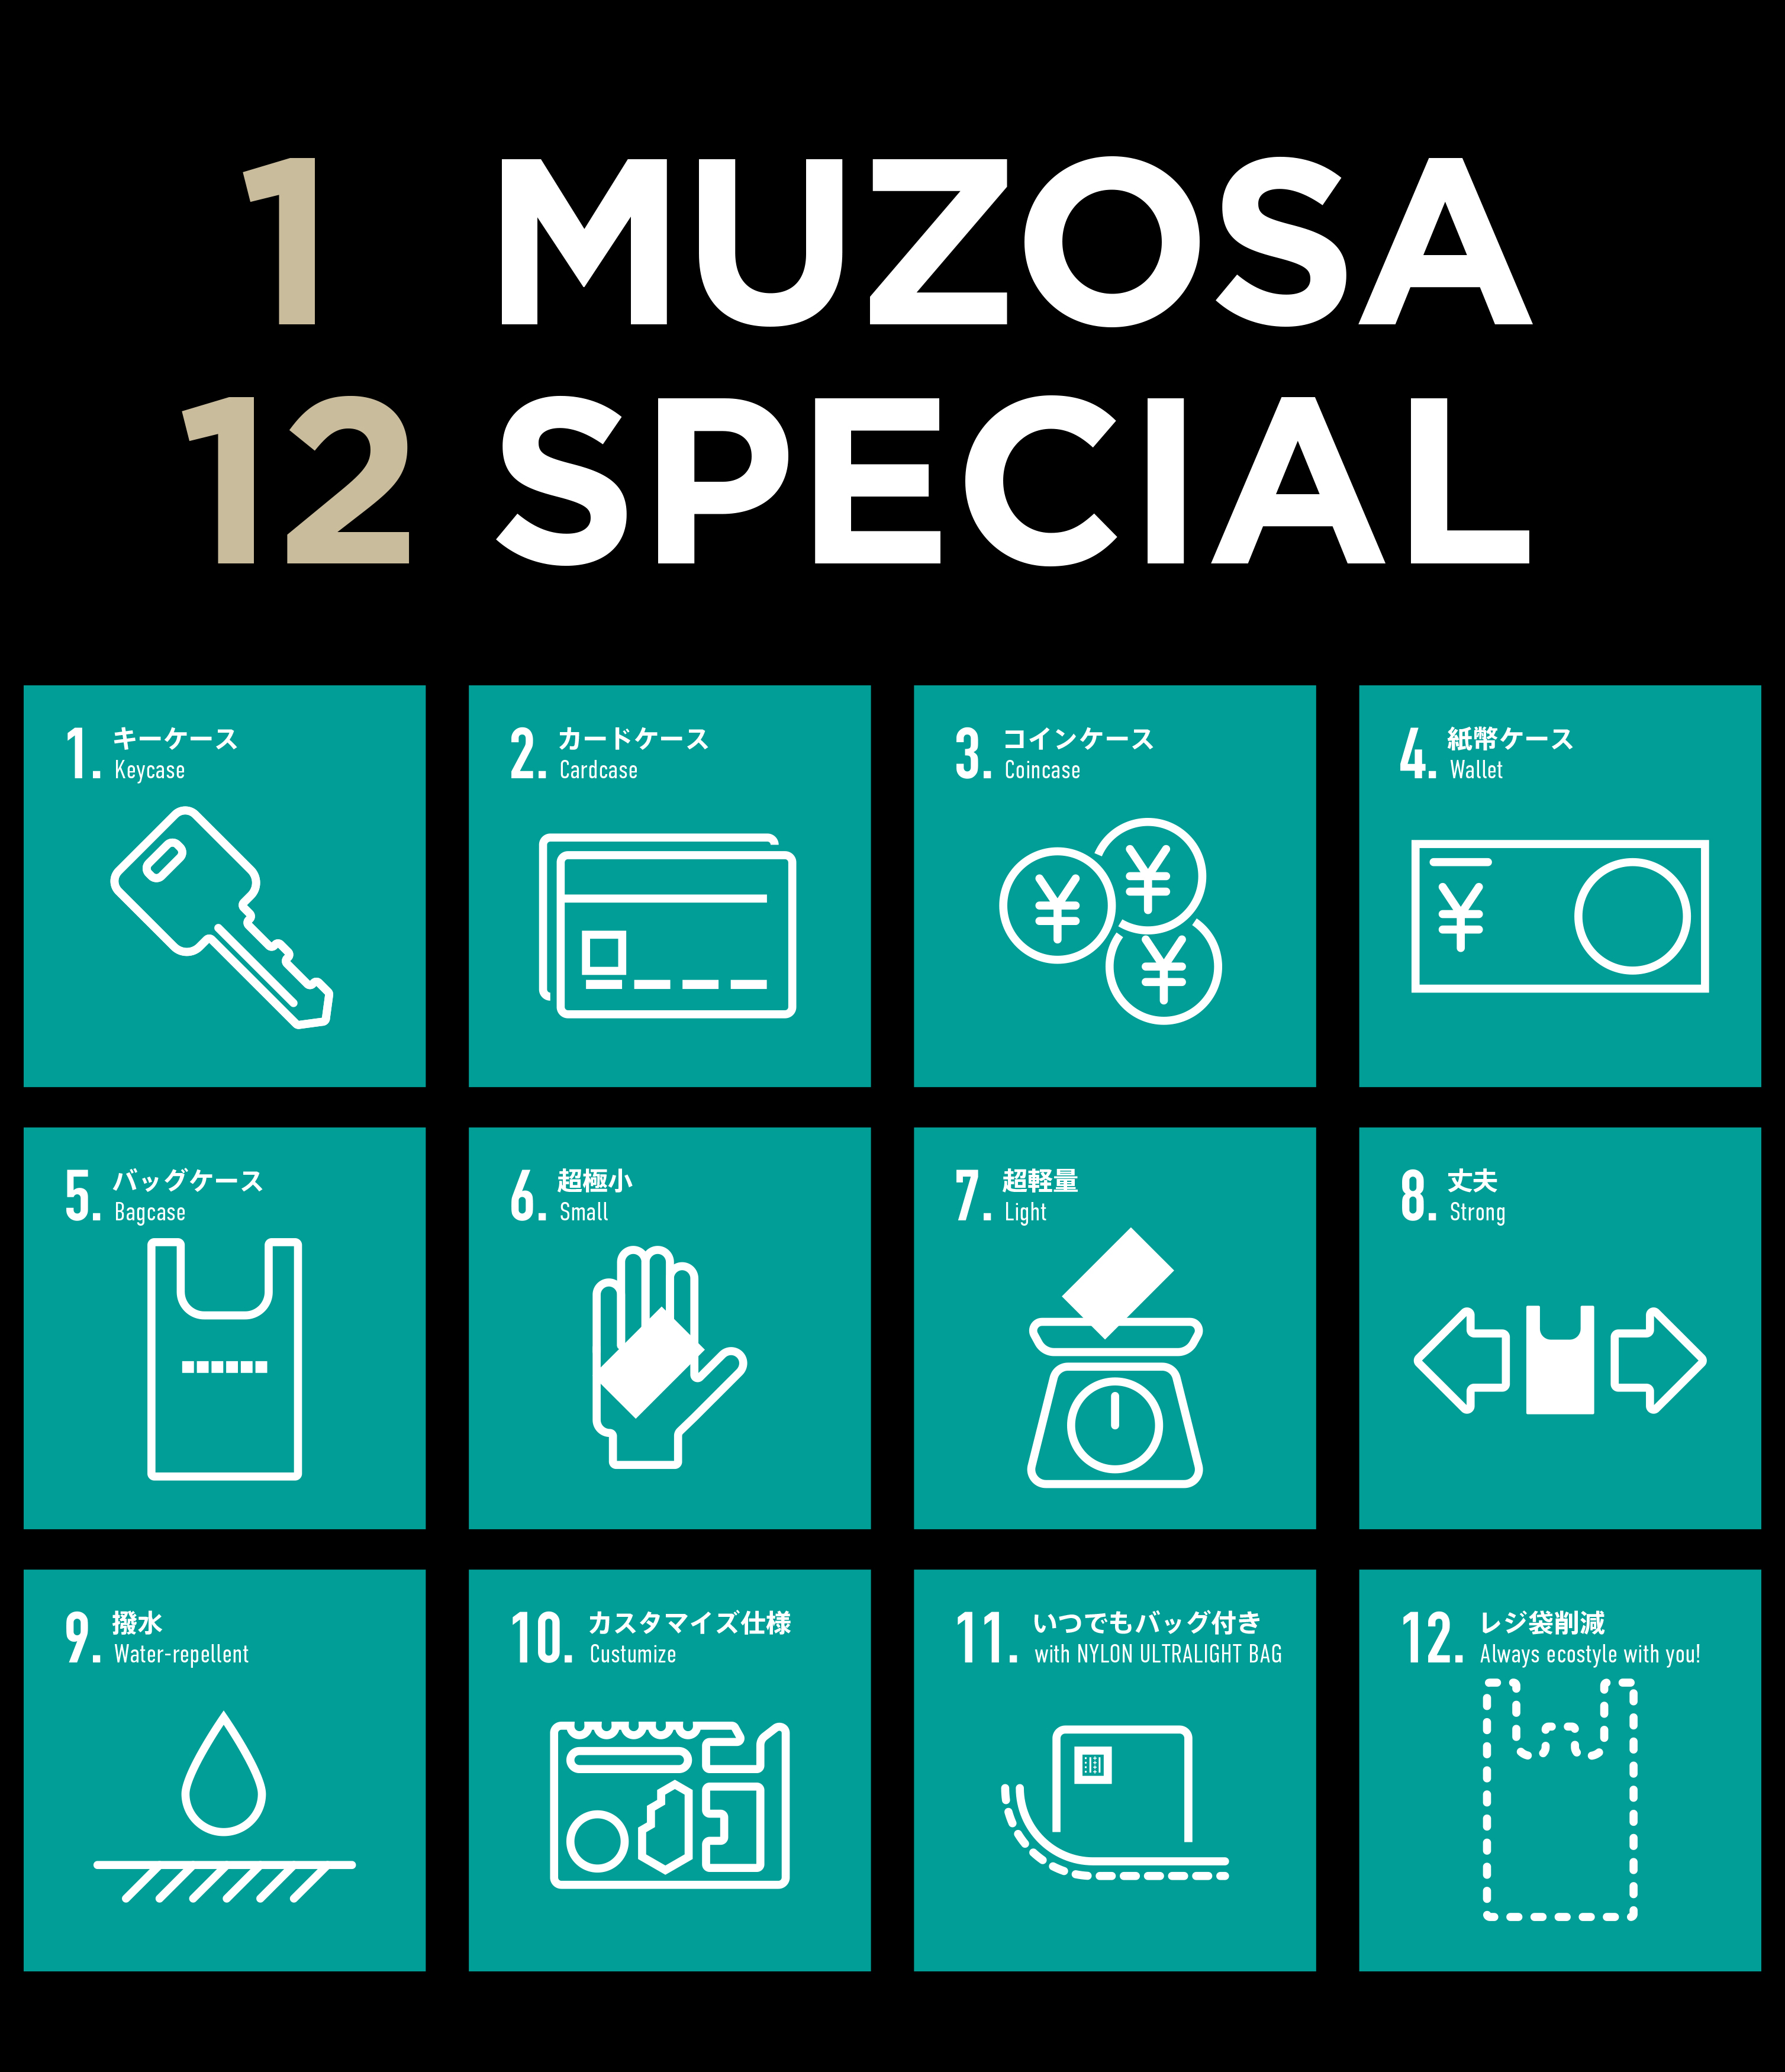 1MUZOSA 12SPECIAL